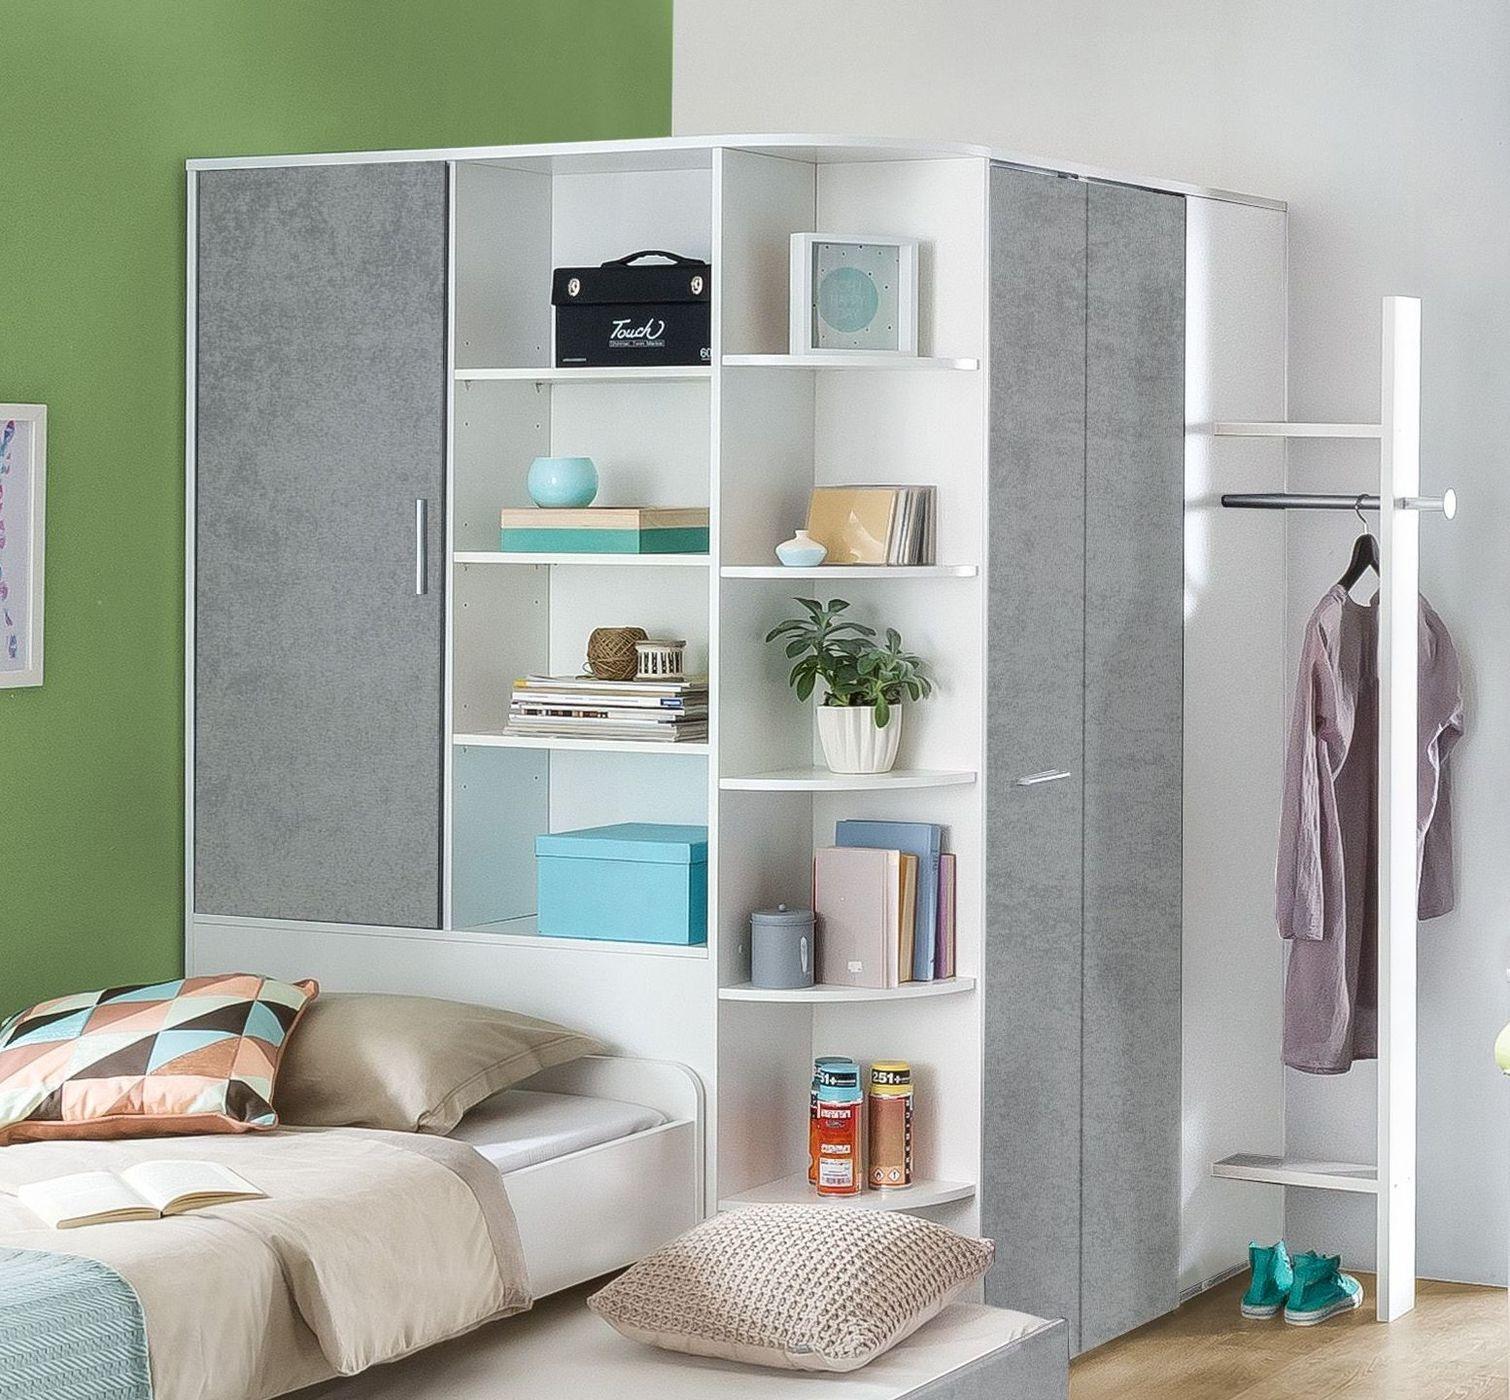 begehbarer eck kleiderschrank mit beleuchtung porvenir. Black Bedroom Furniture Sets. Home Design Ideas